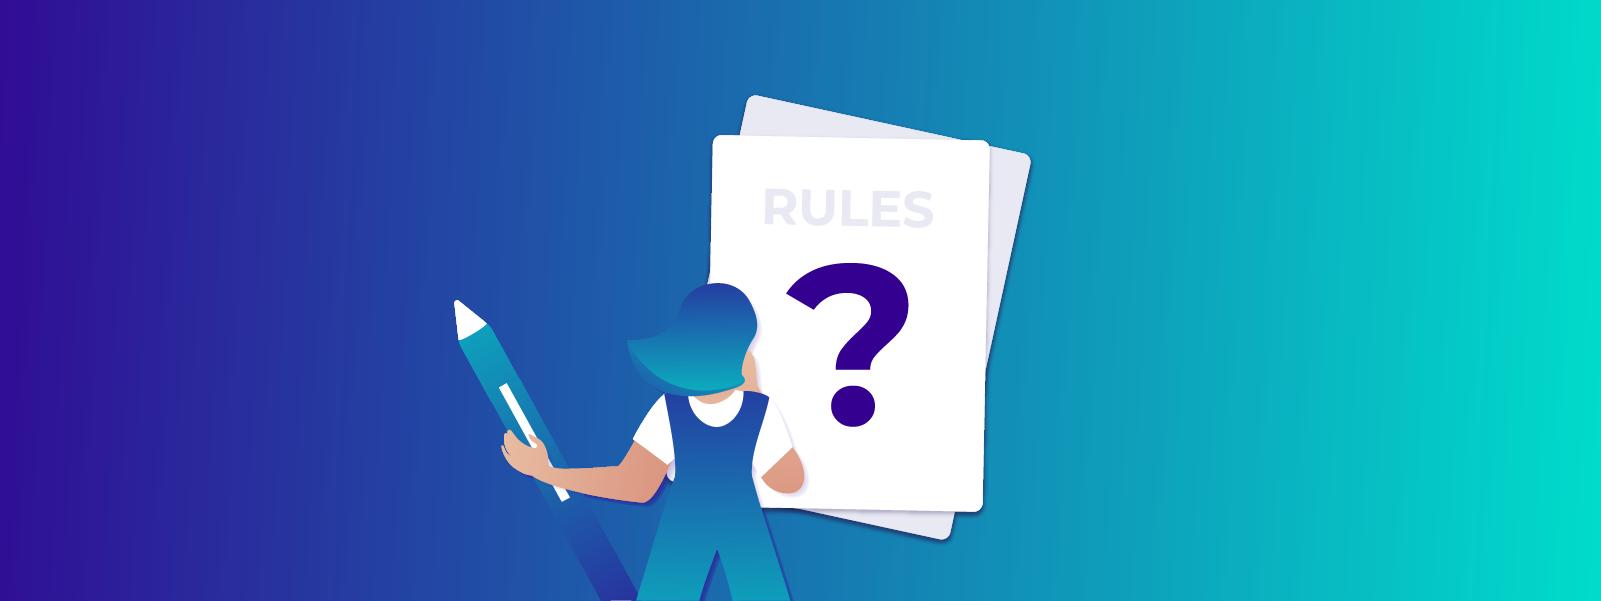 B-creer-des-regles-qualite-efficace